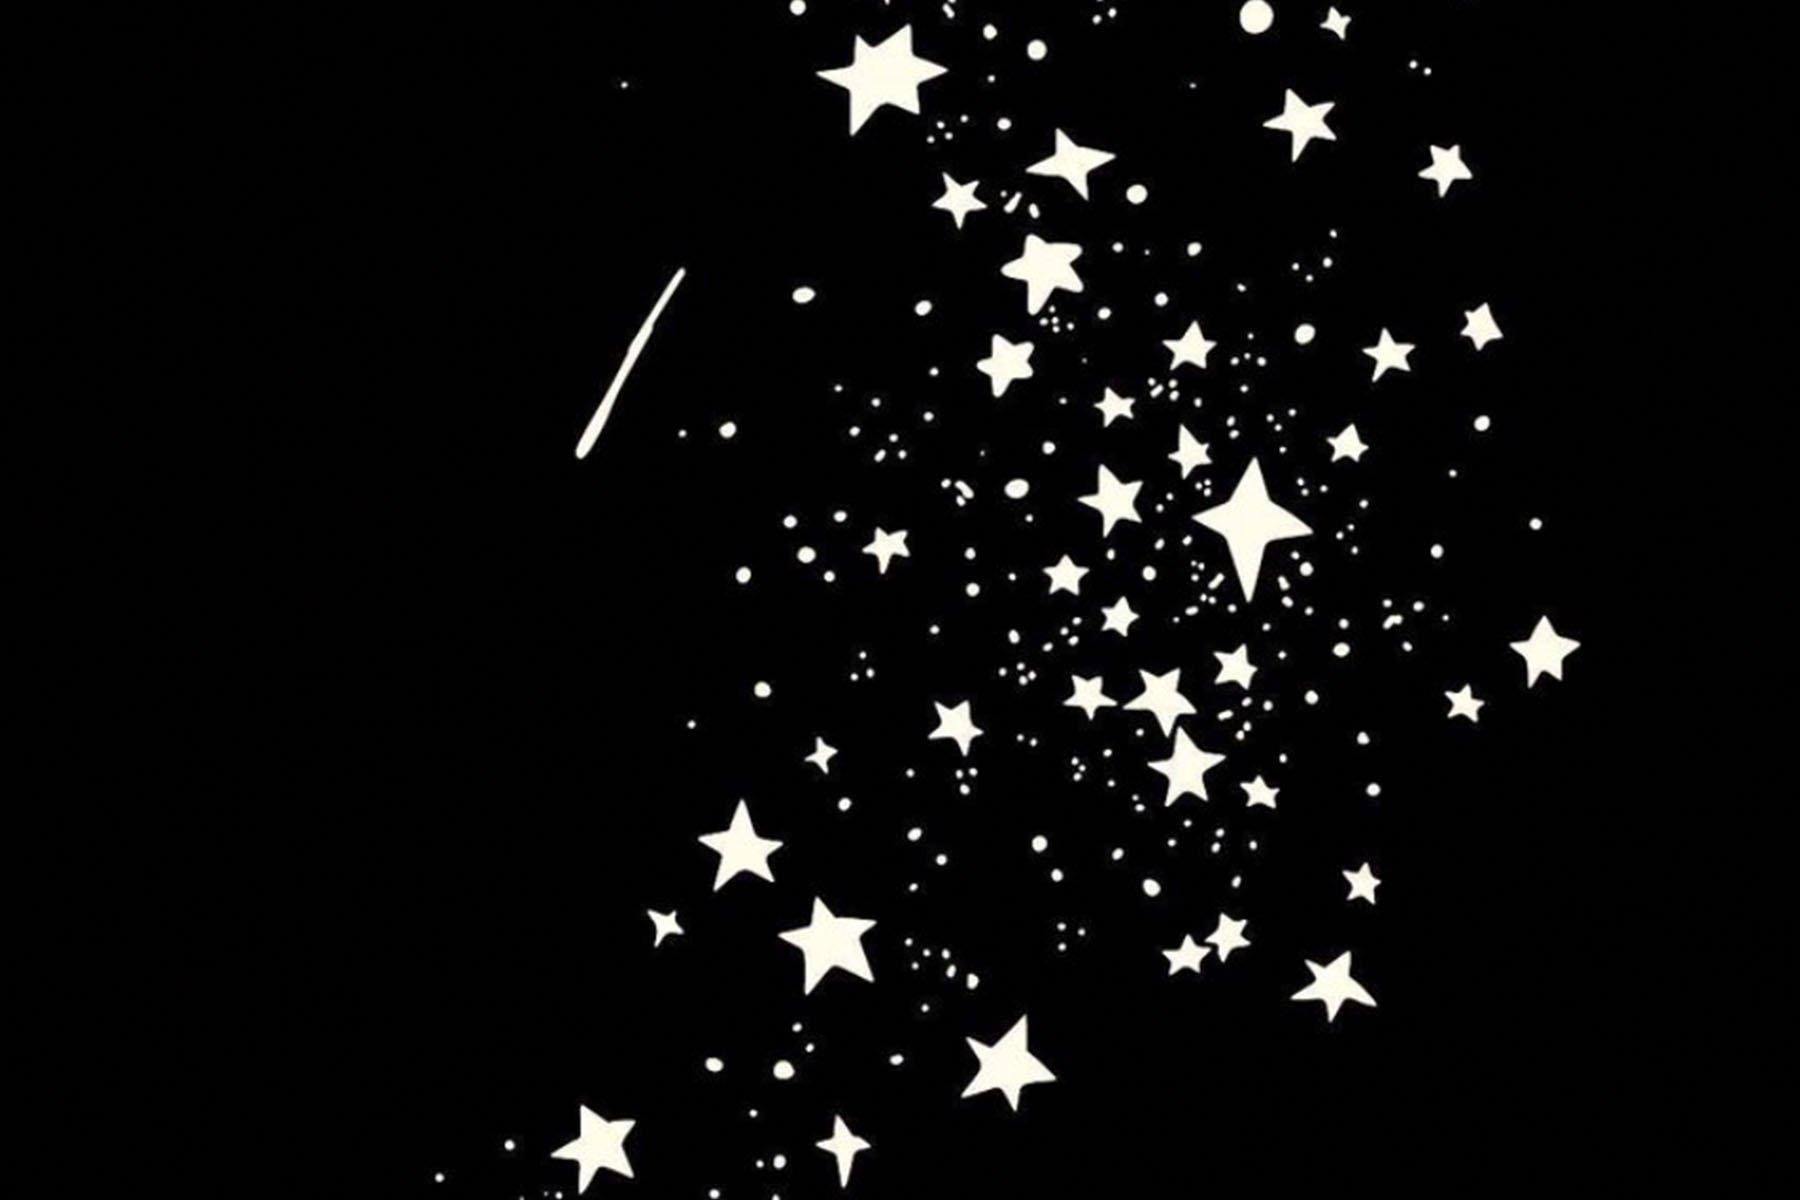 Weekly Horoscopes: March 22-28, 2021